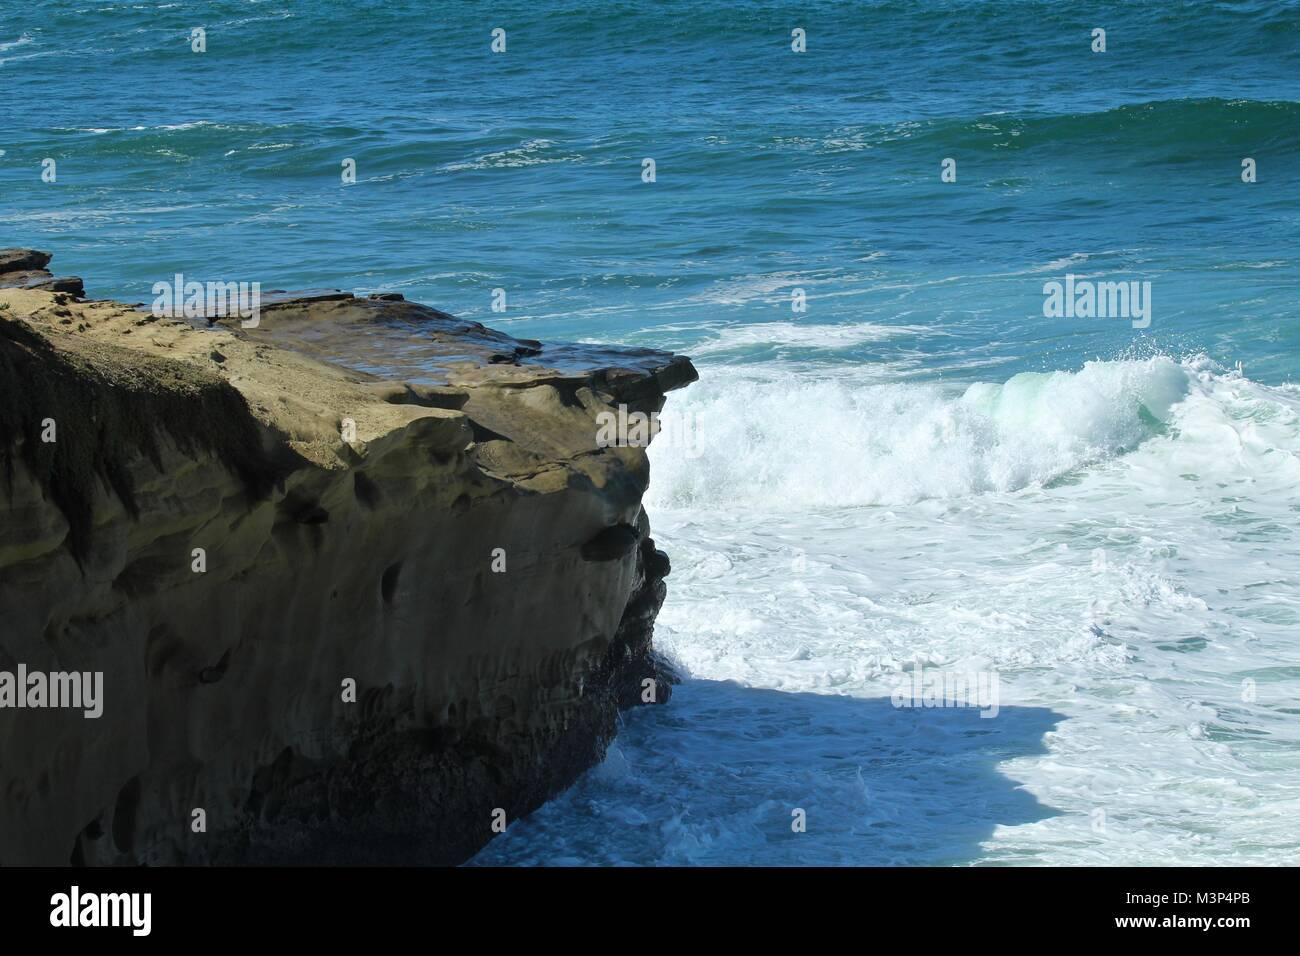 waves crashing on cliffs in La Jolla California - Stock Image